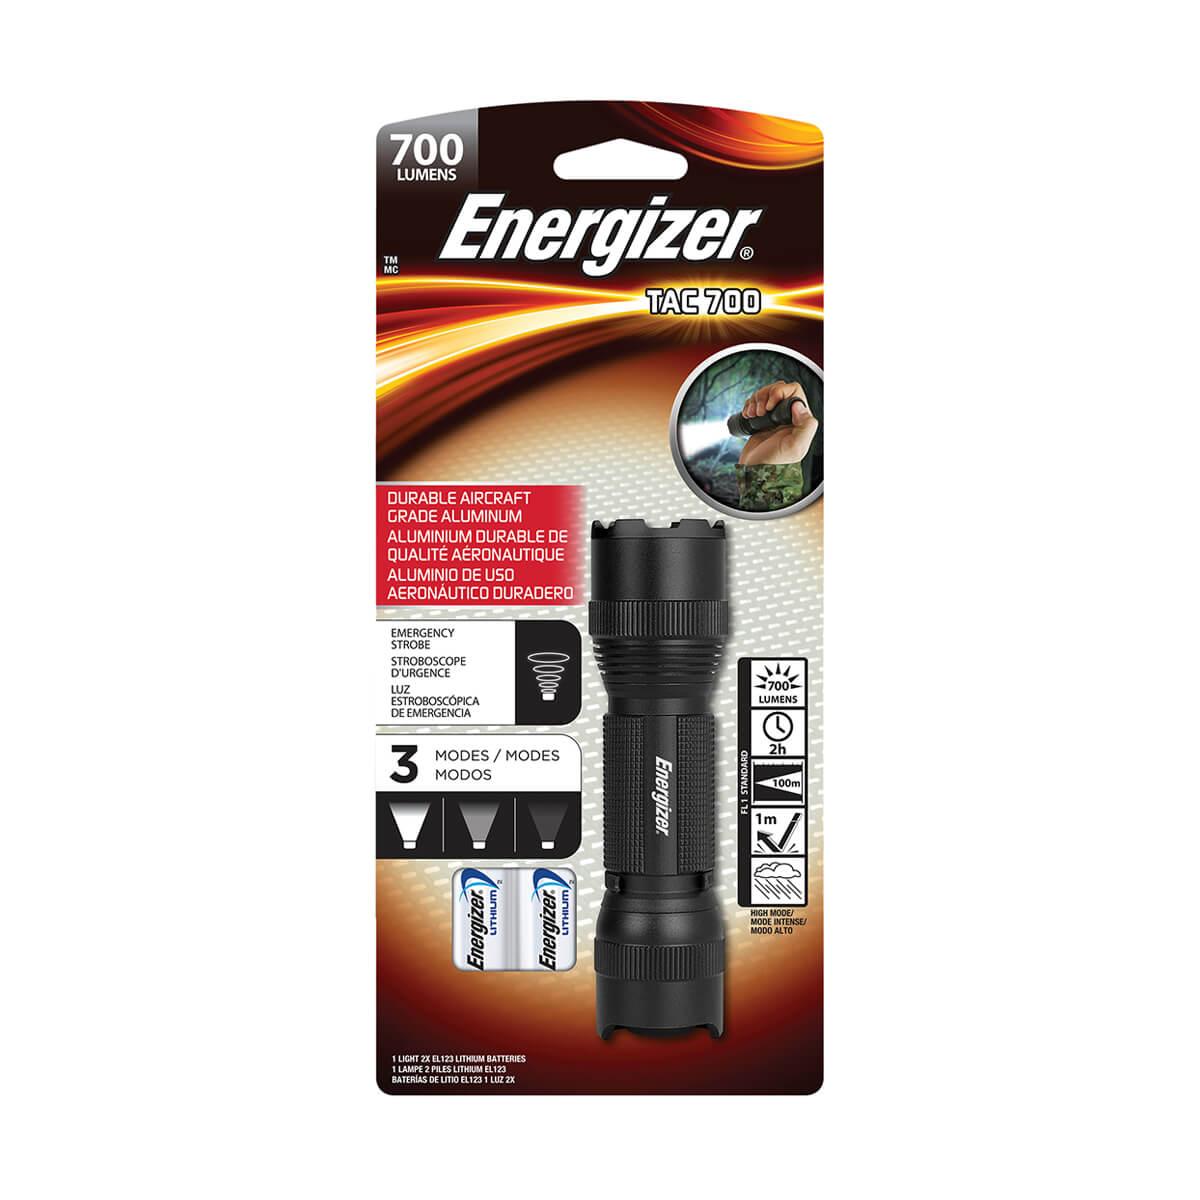 Energizer Vision HD LED Flashlight - Black - 700 lumens